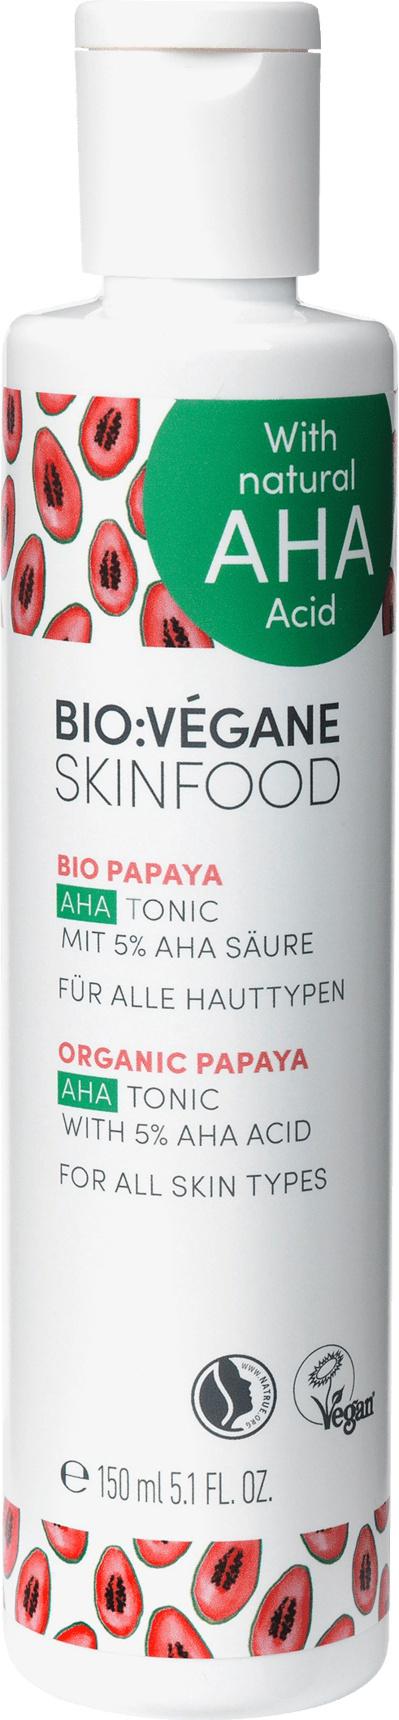 BIO VÉGANE Gesichtswasser Bio:Végane Bio Papaya Aha Tonic